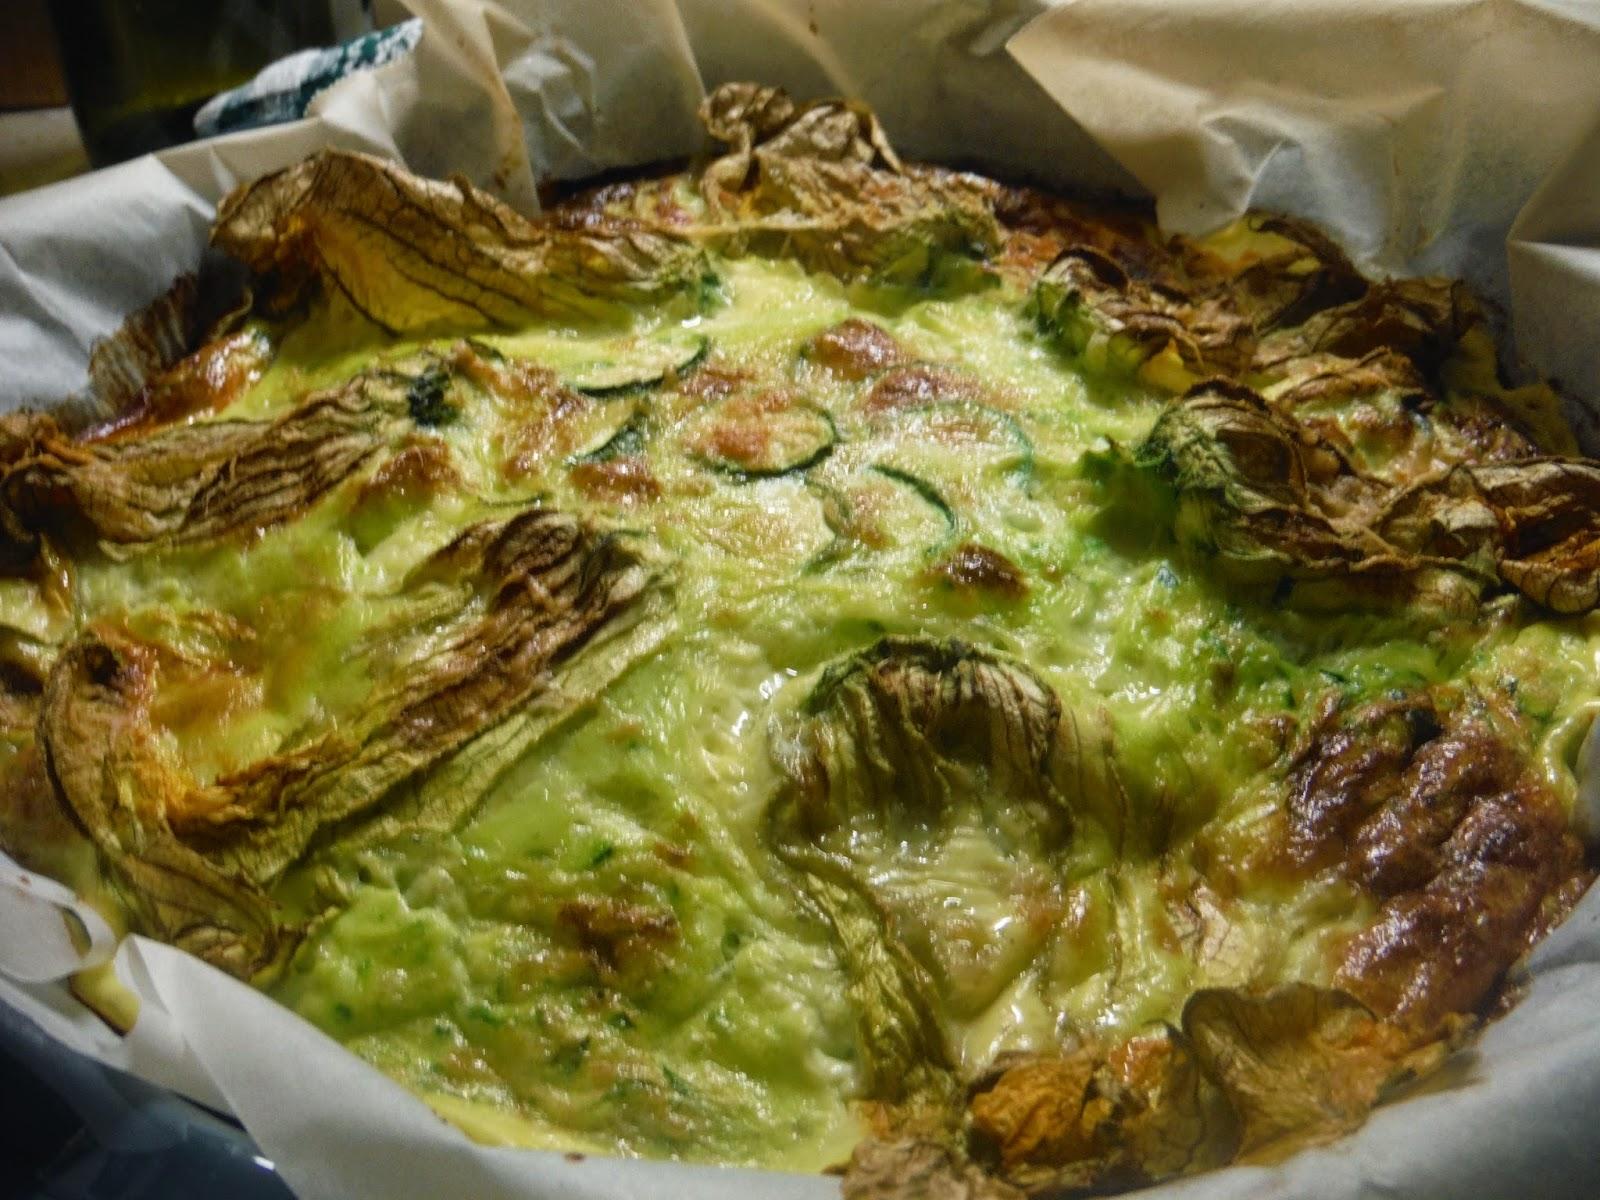 Torte salate con yogurt greco